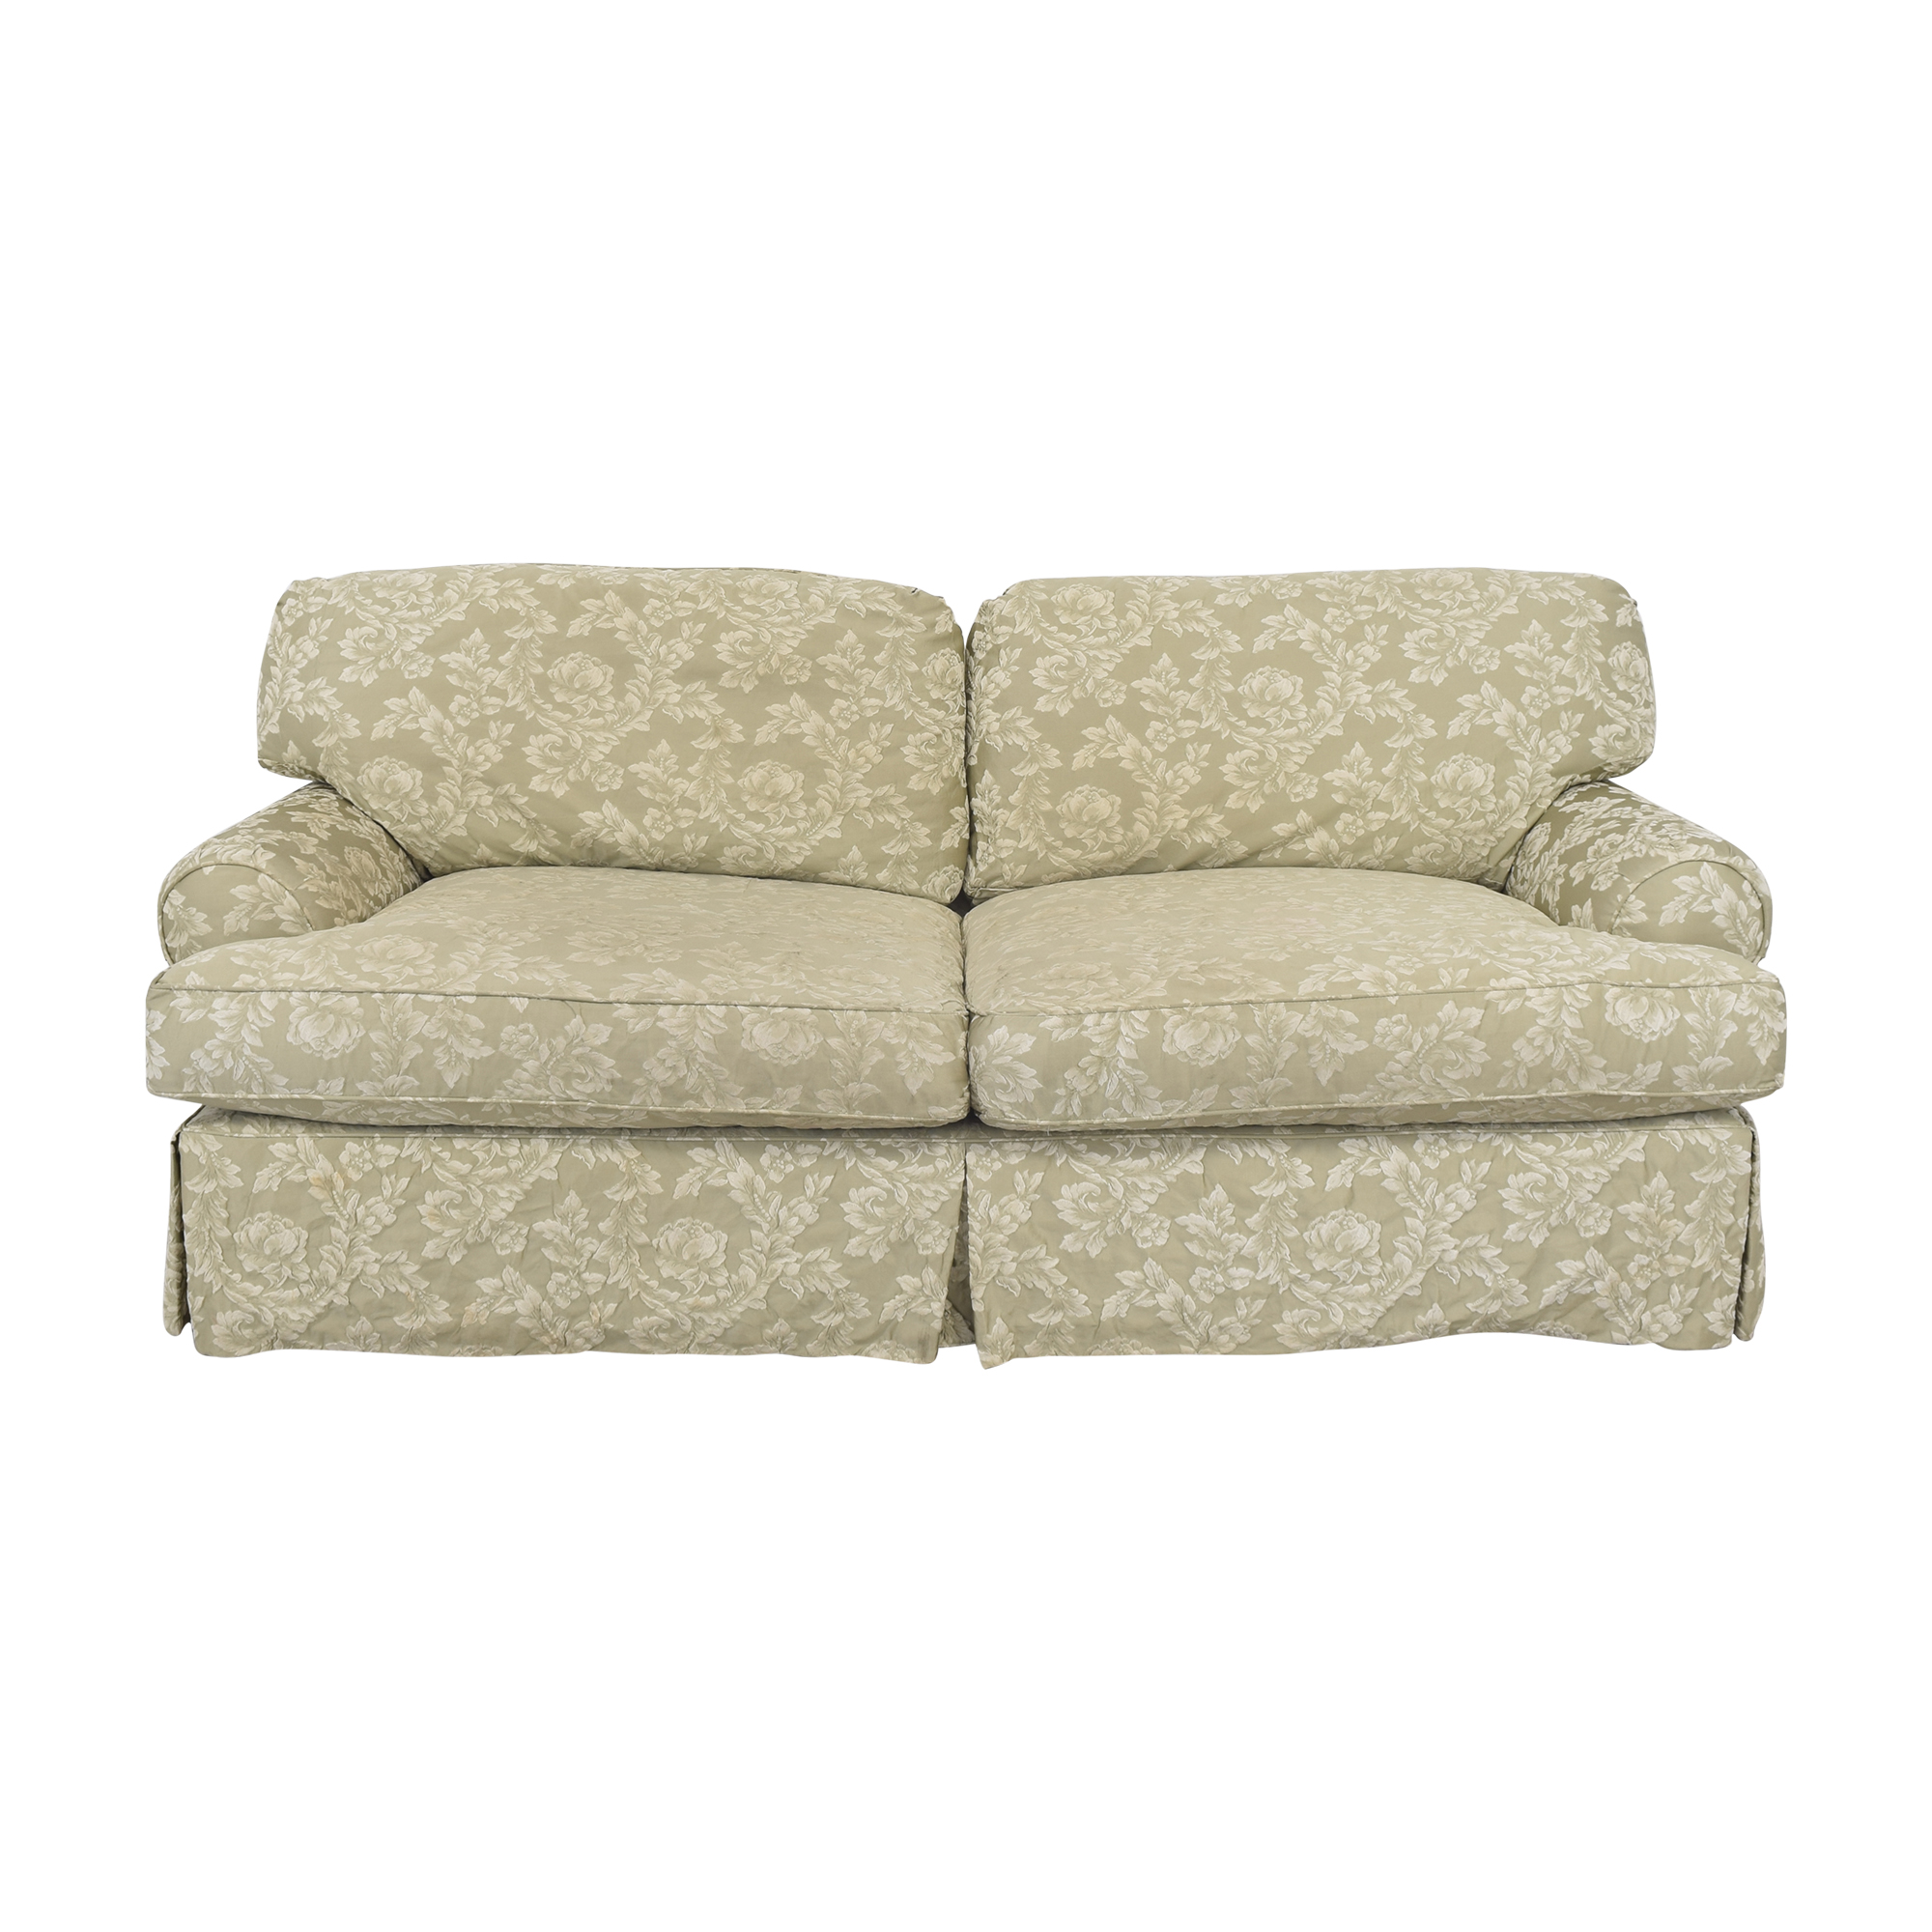 Domain Domain Skirted Two Cushion Sofa nyc